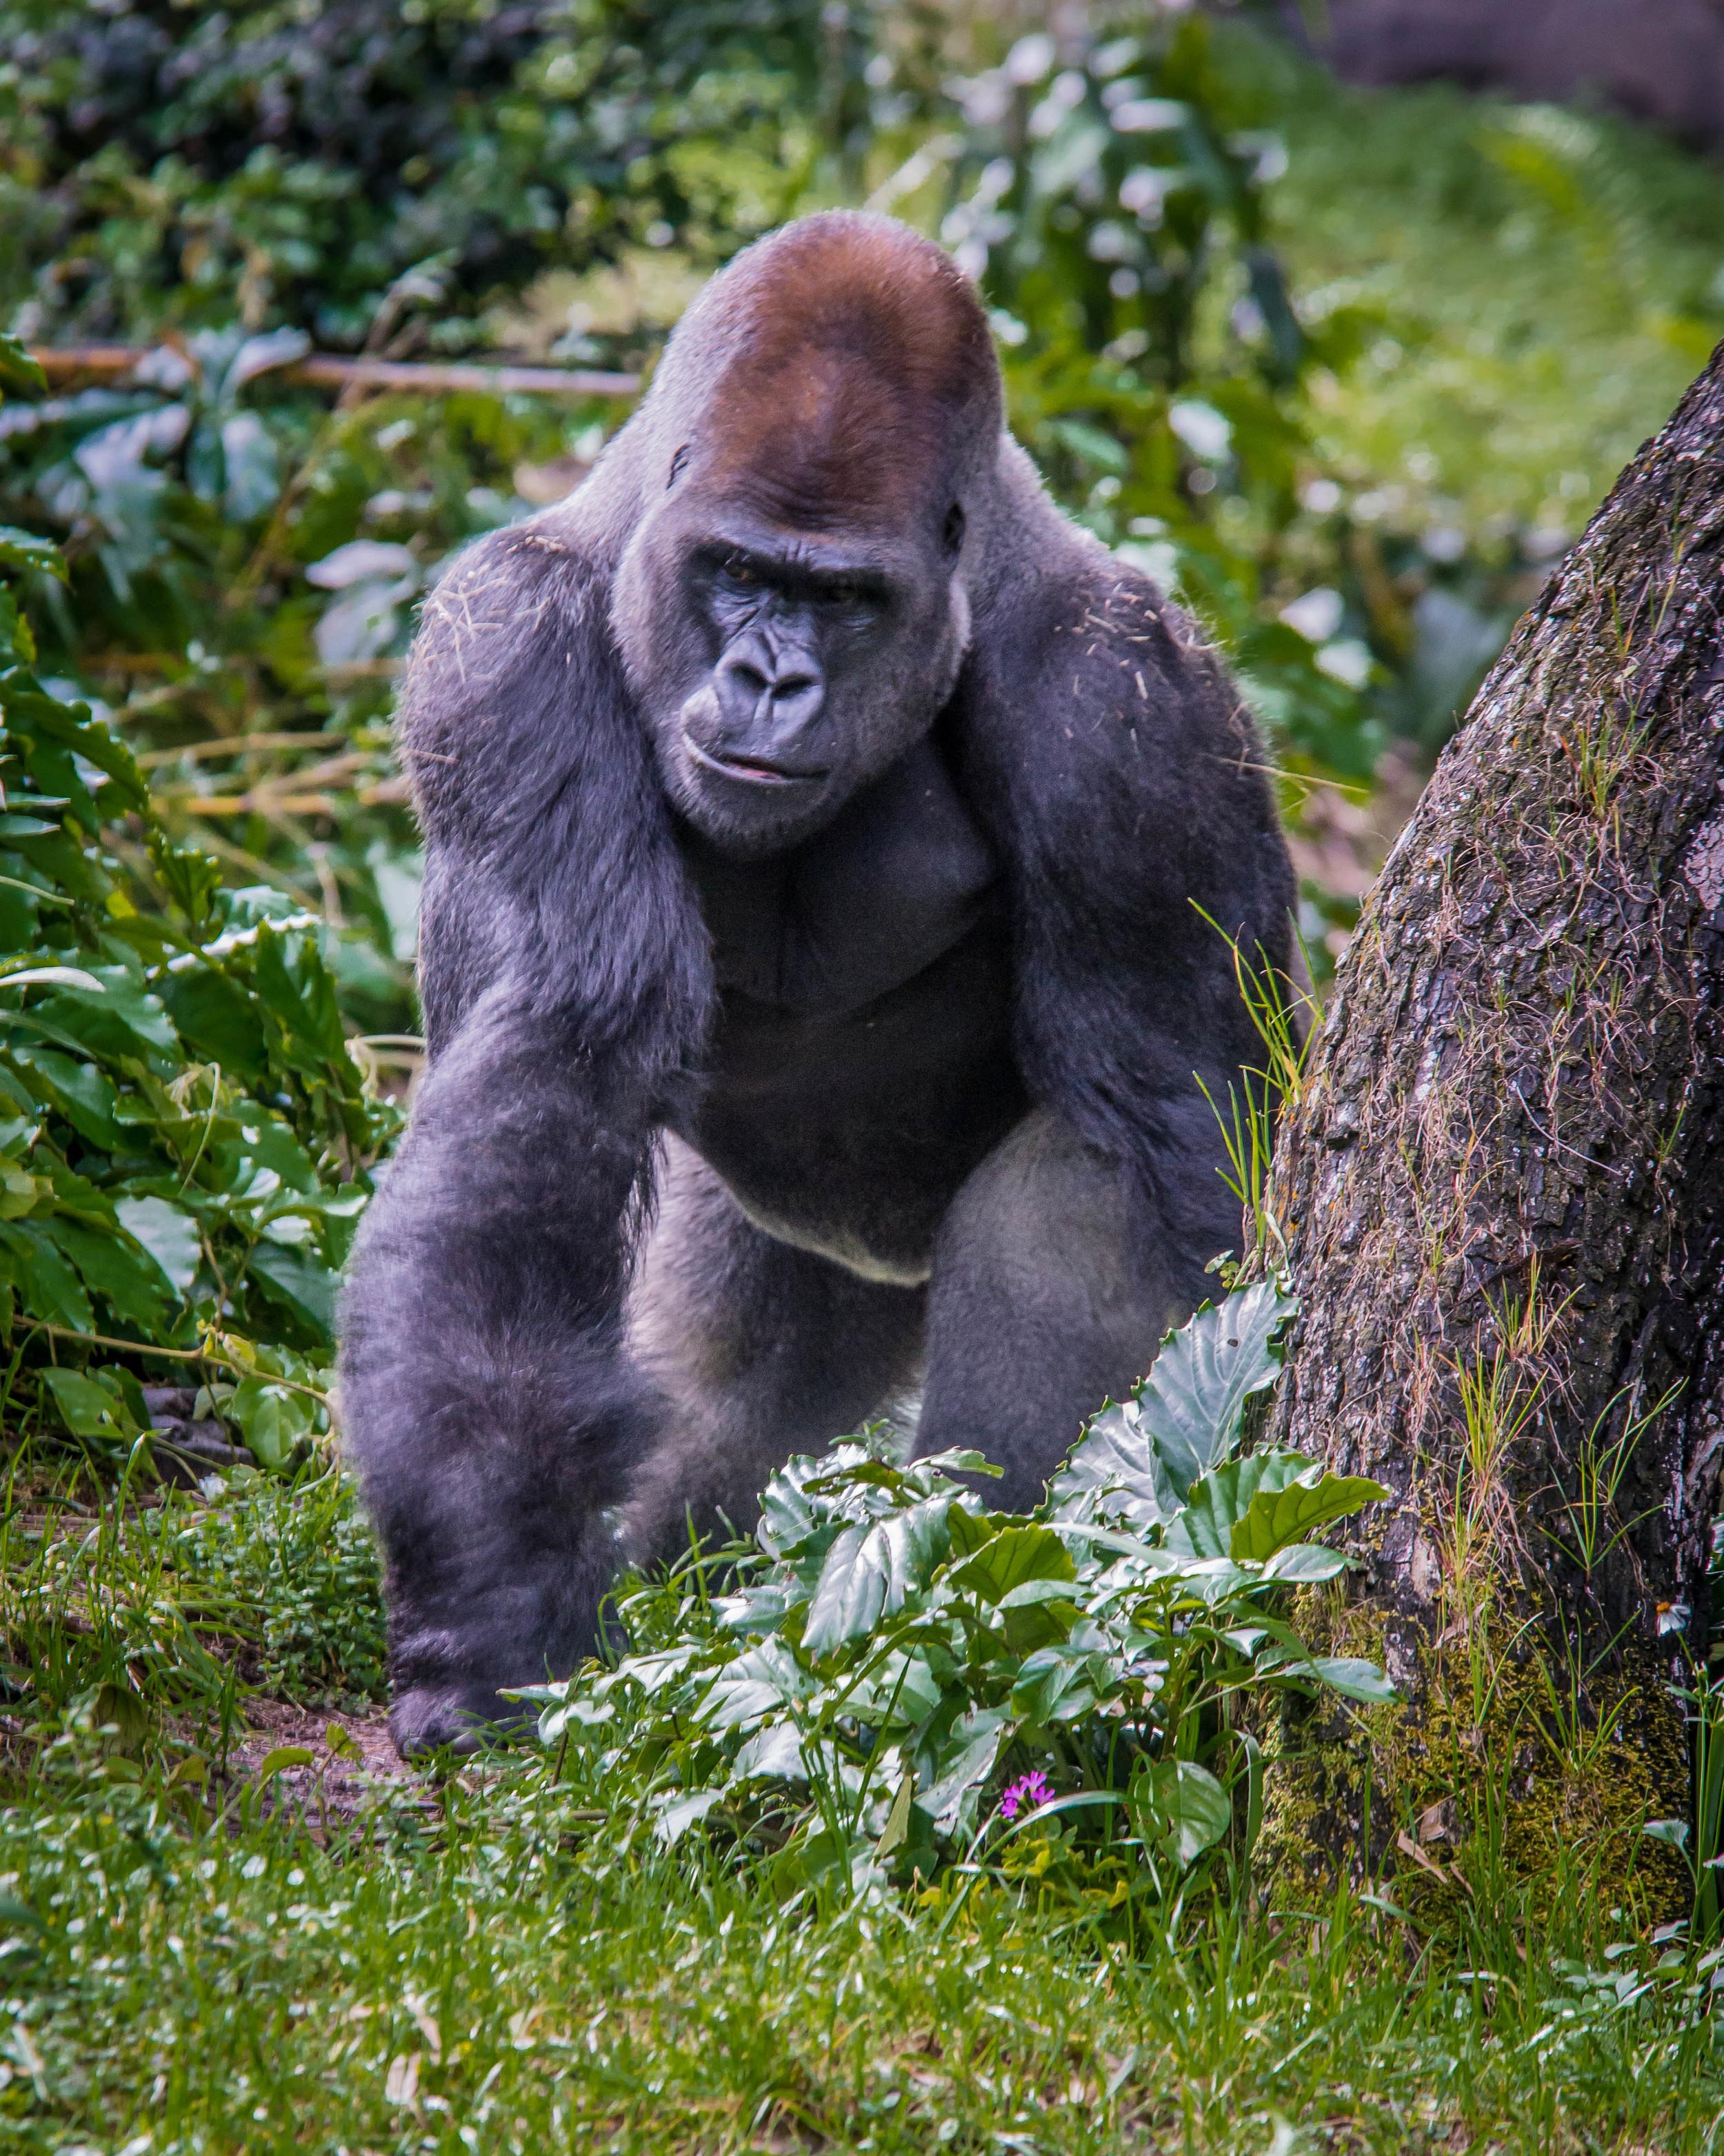 Gorilla on Guard